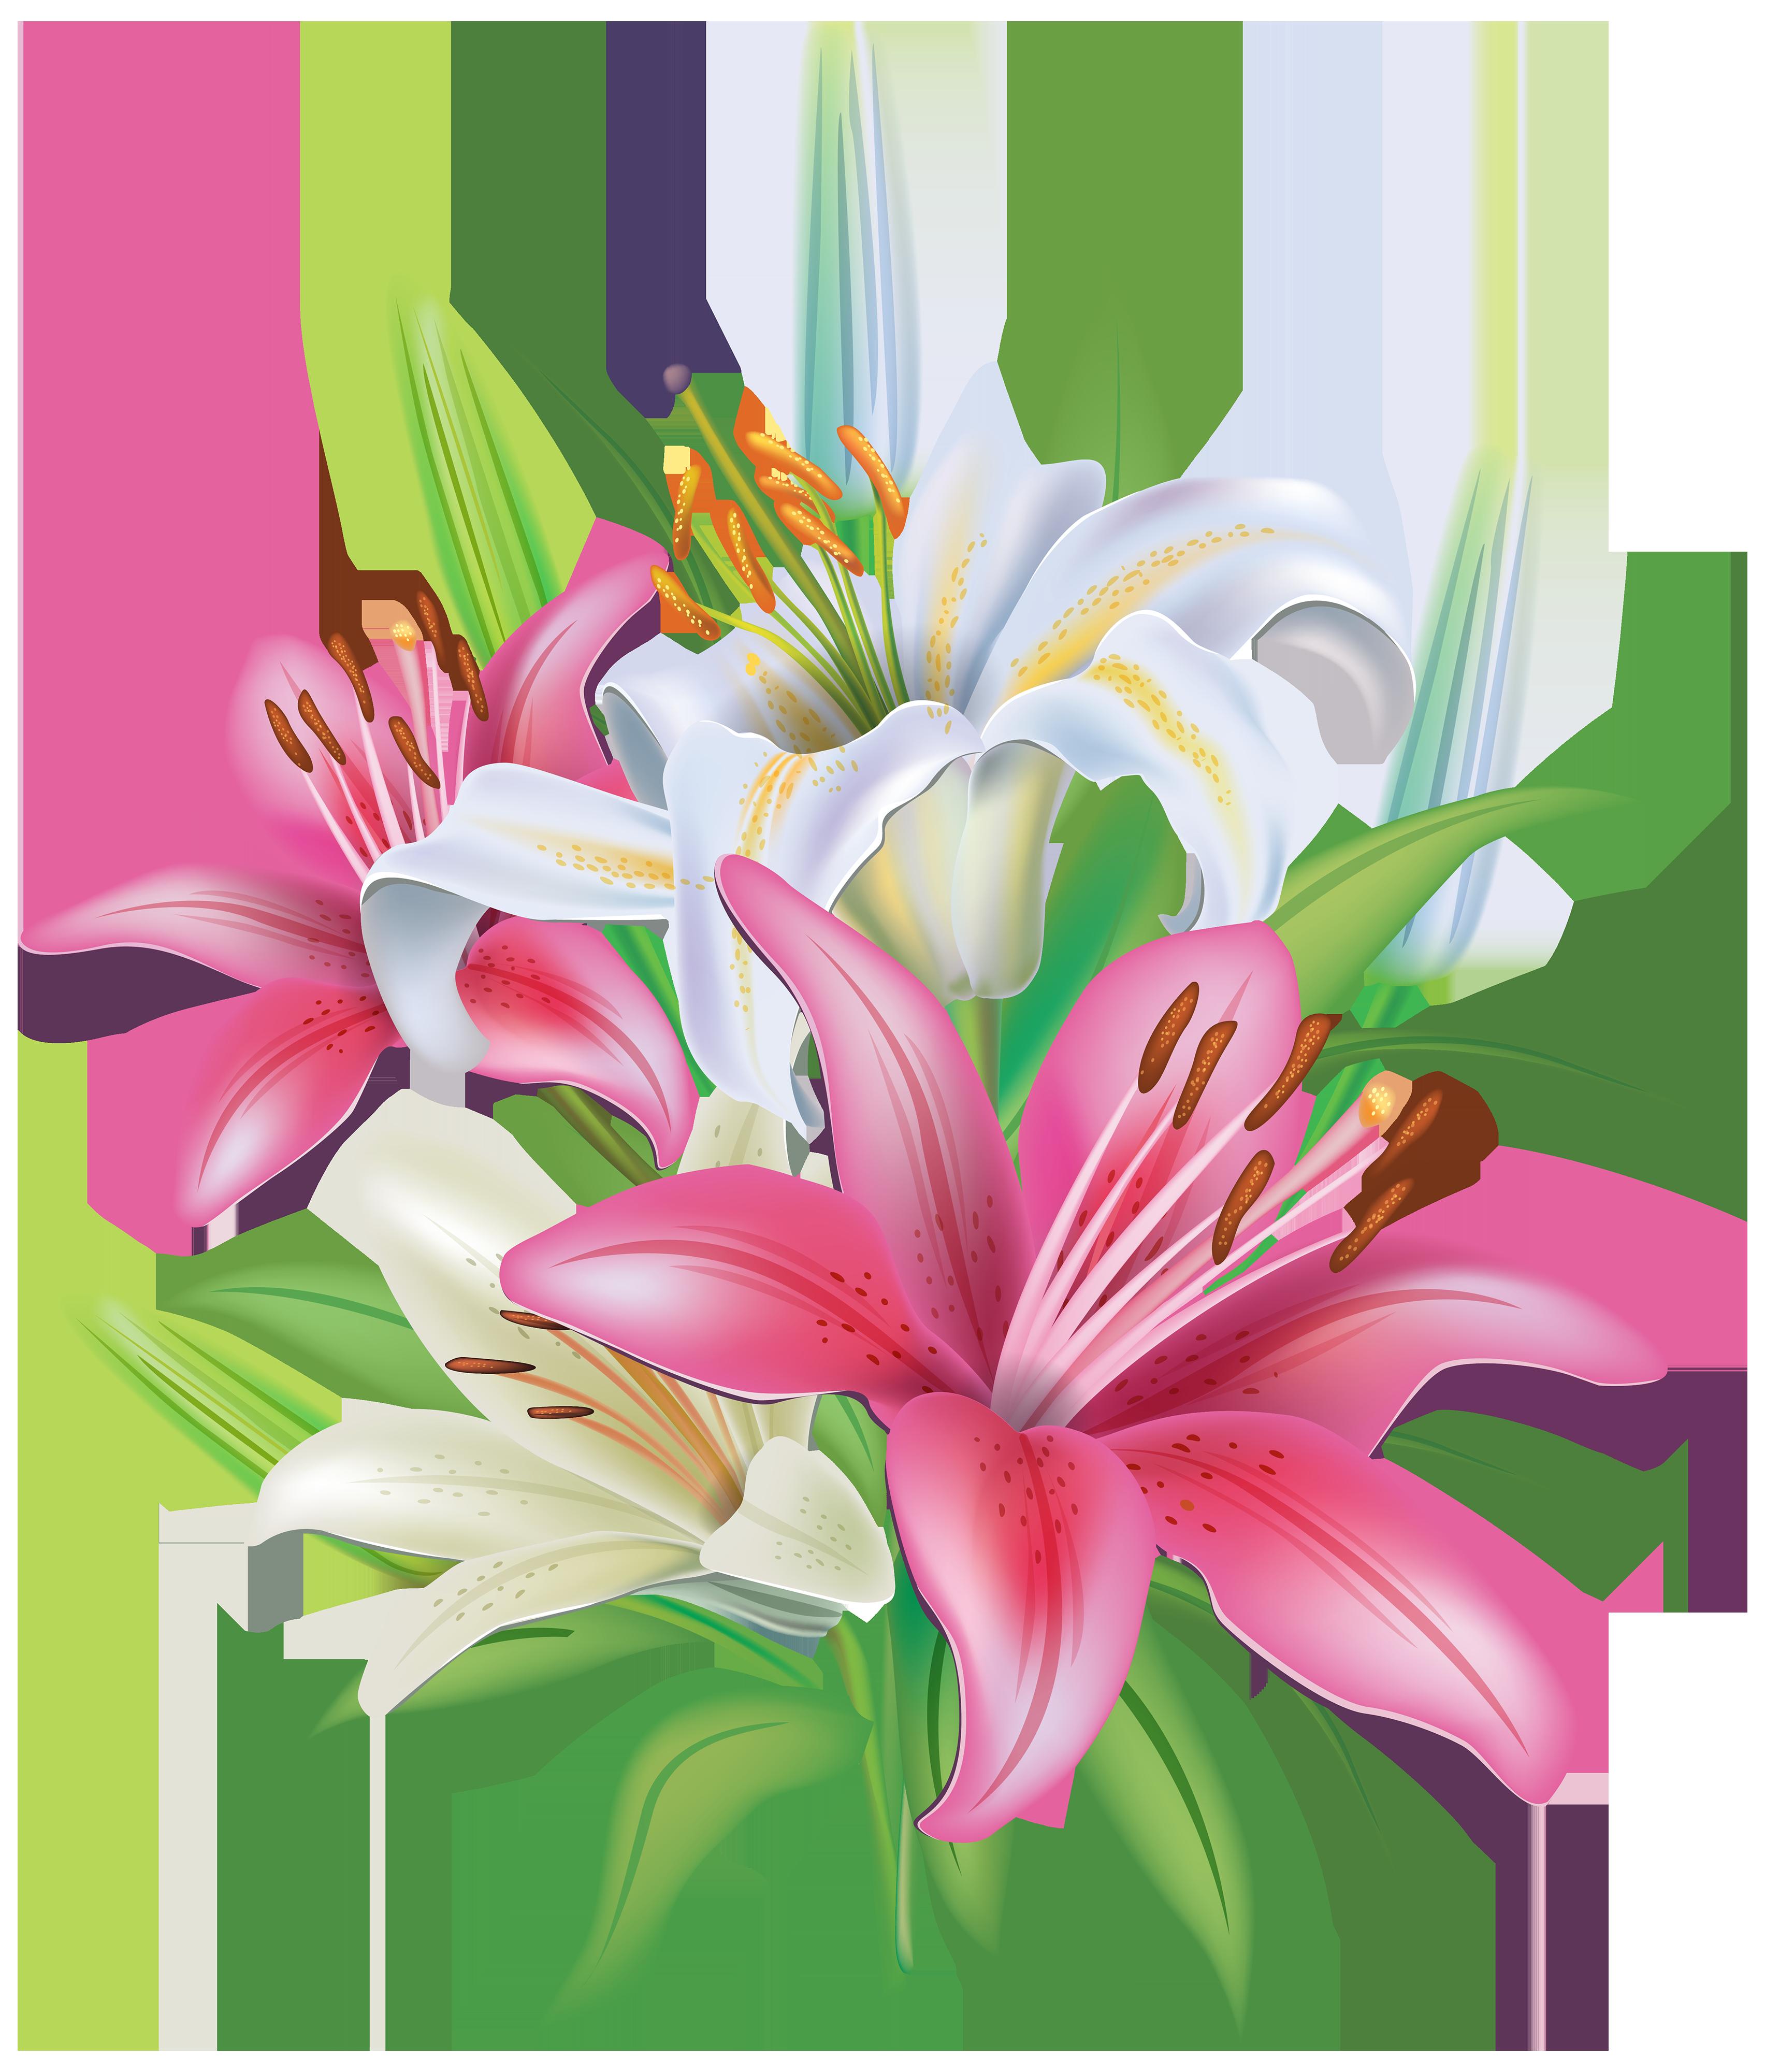 Pink lilies flores pinterest. Flower reaching for sun clipart